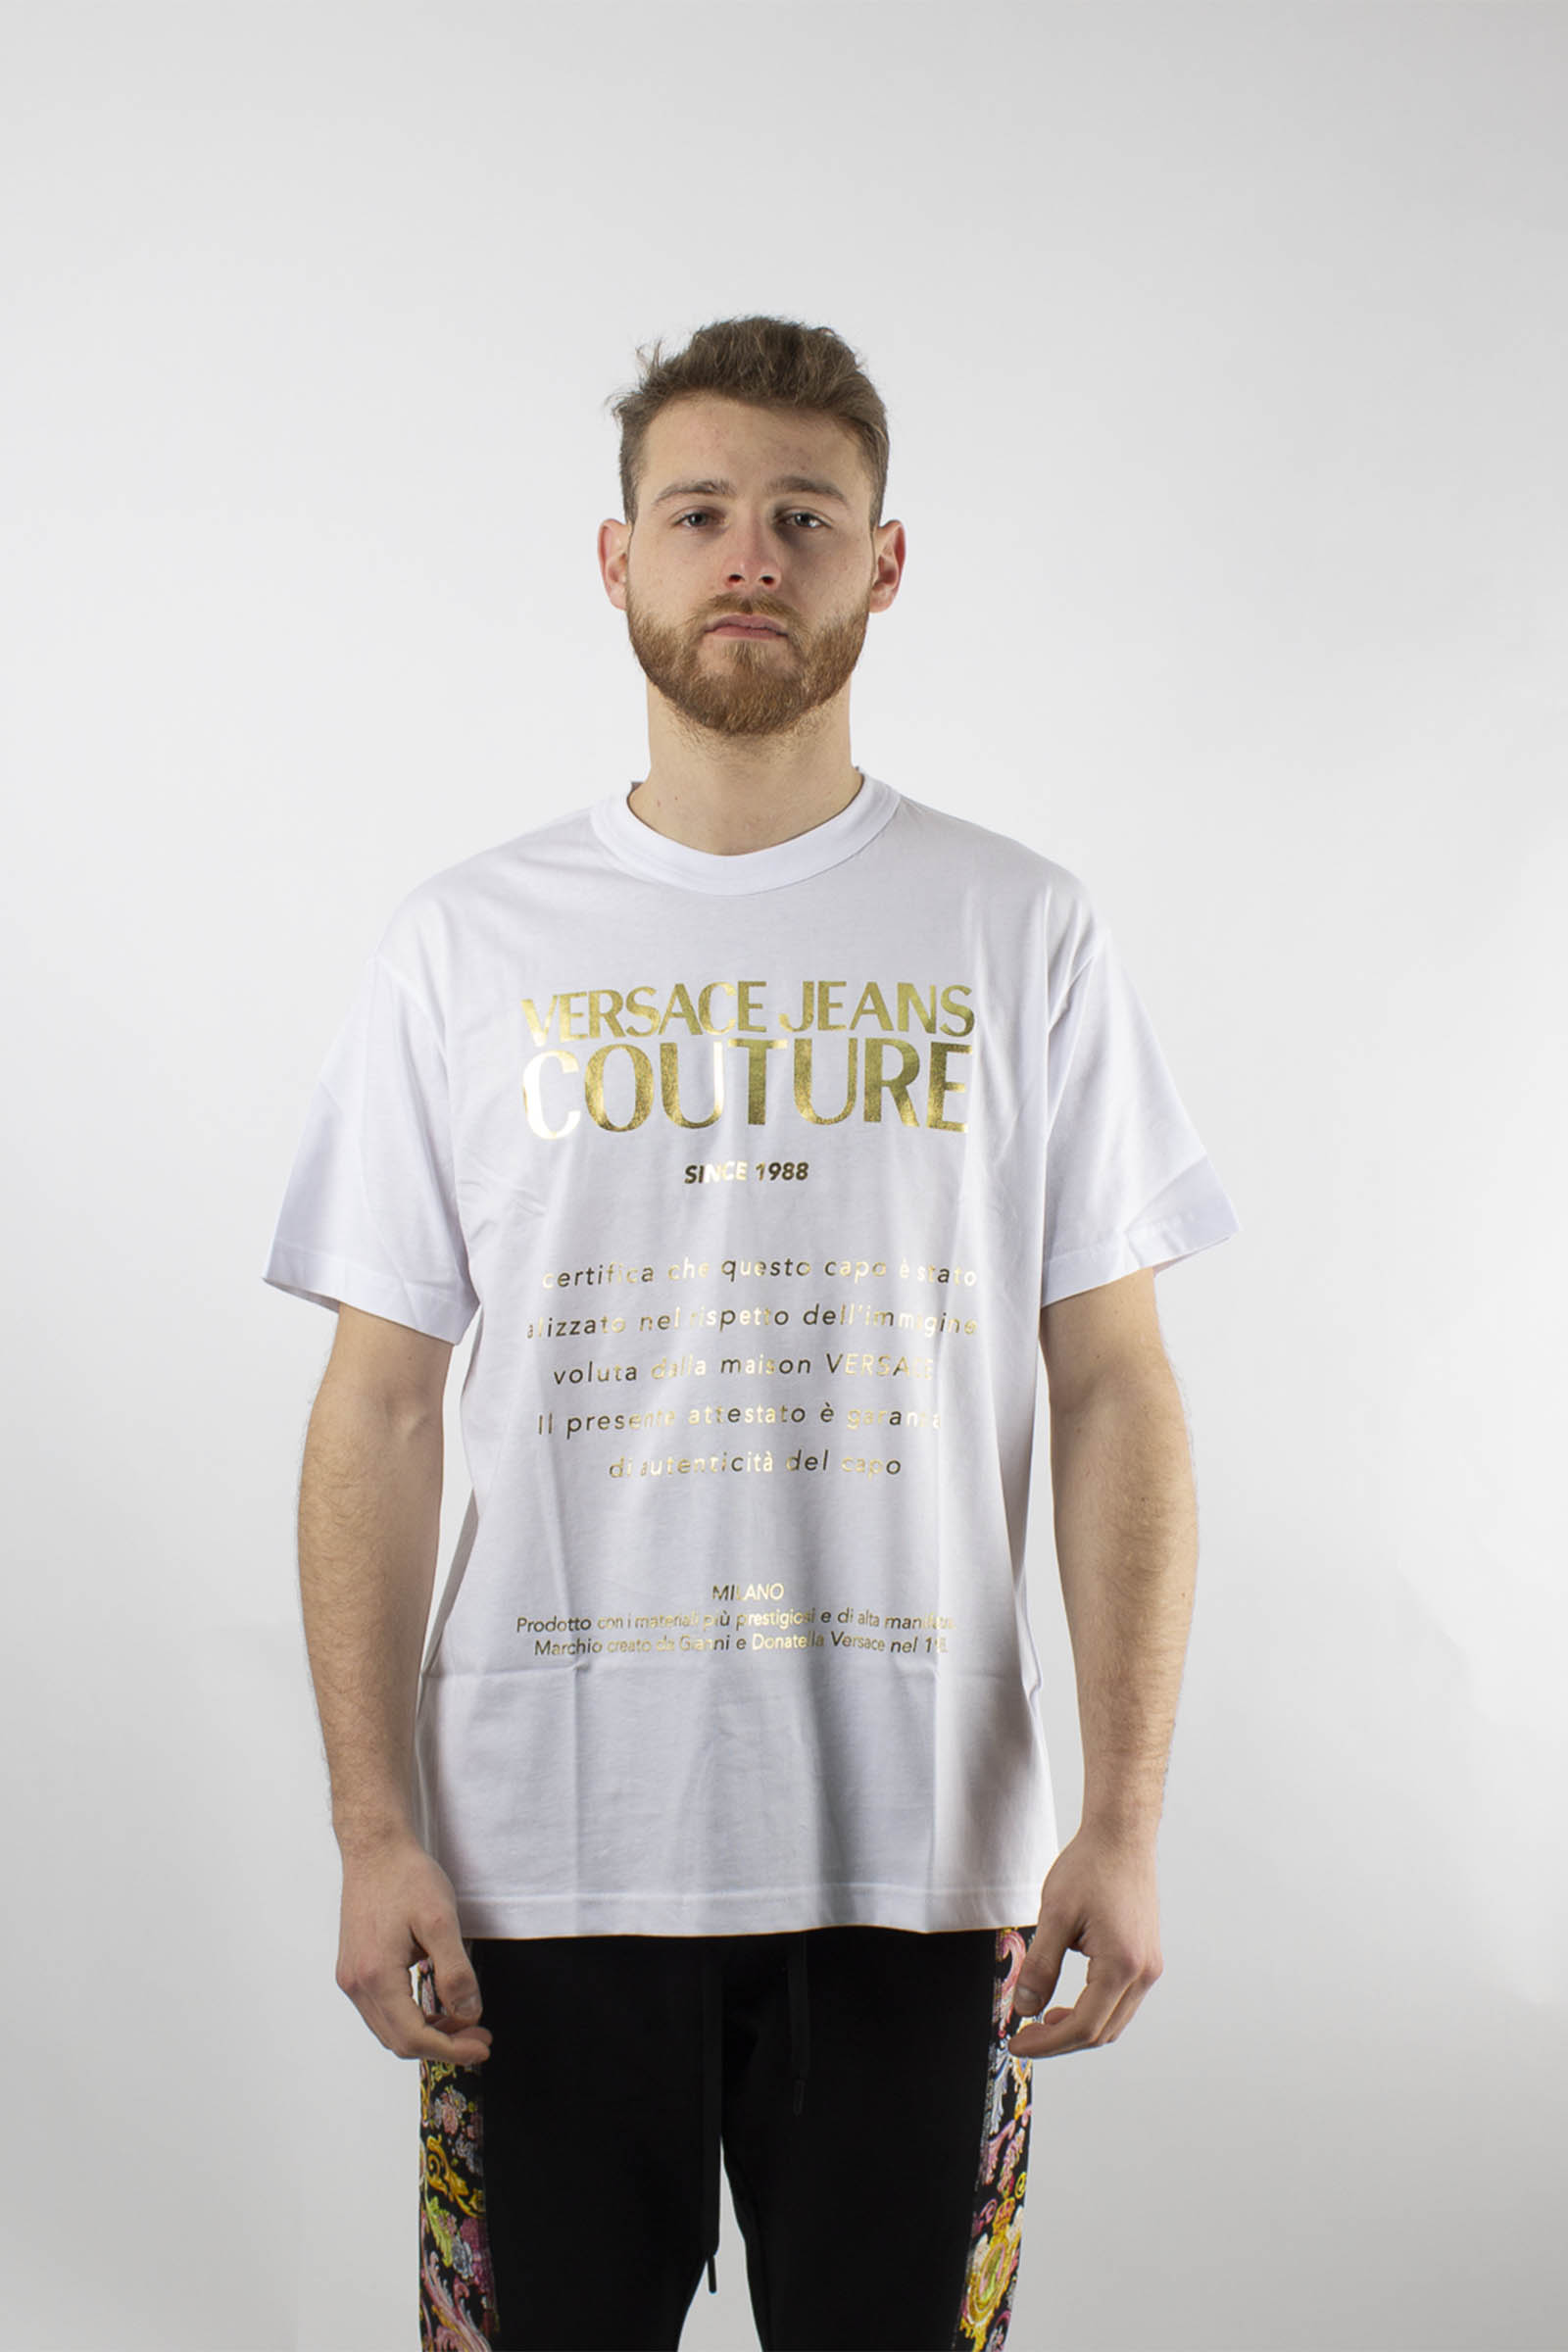 VERSACE JEANS | Shirt2 | B3 GWA7VT 30319K41